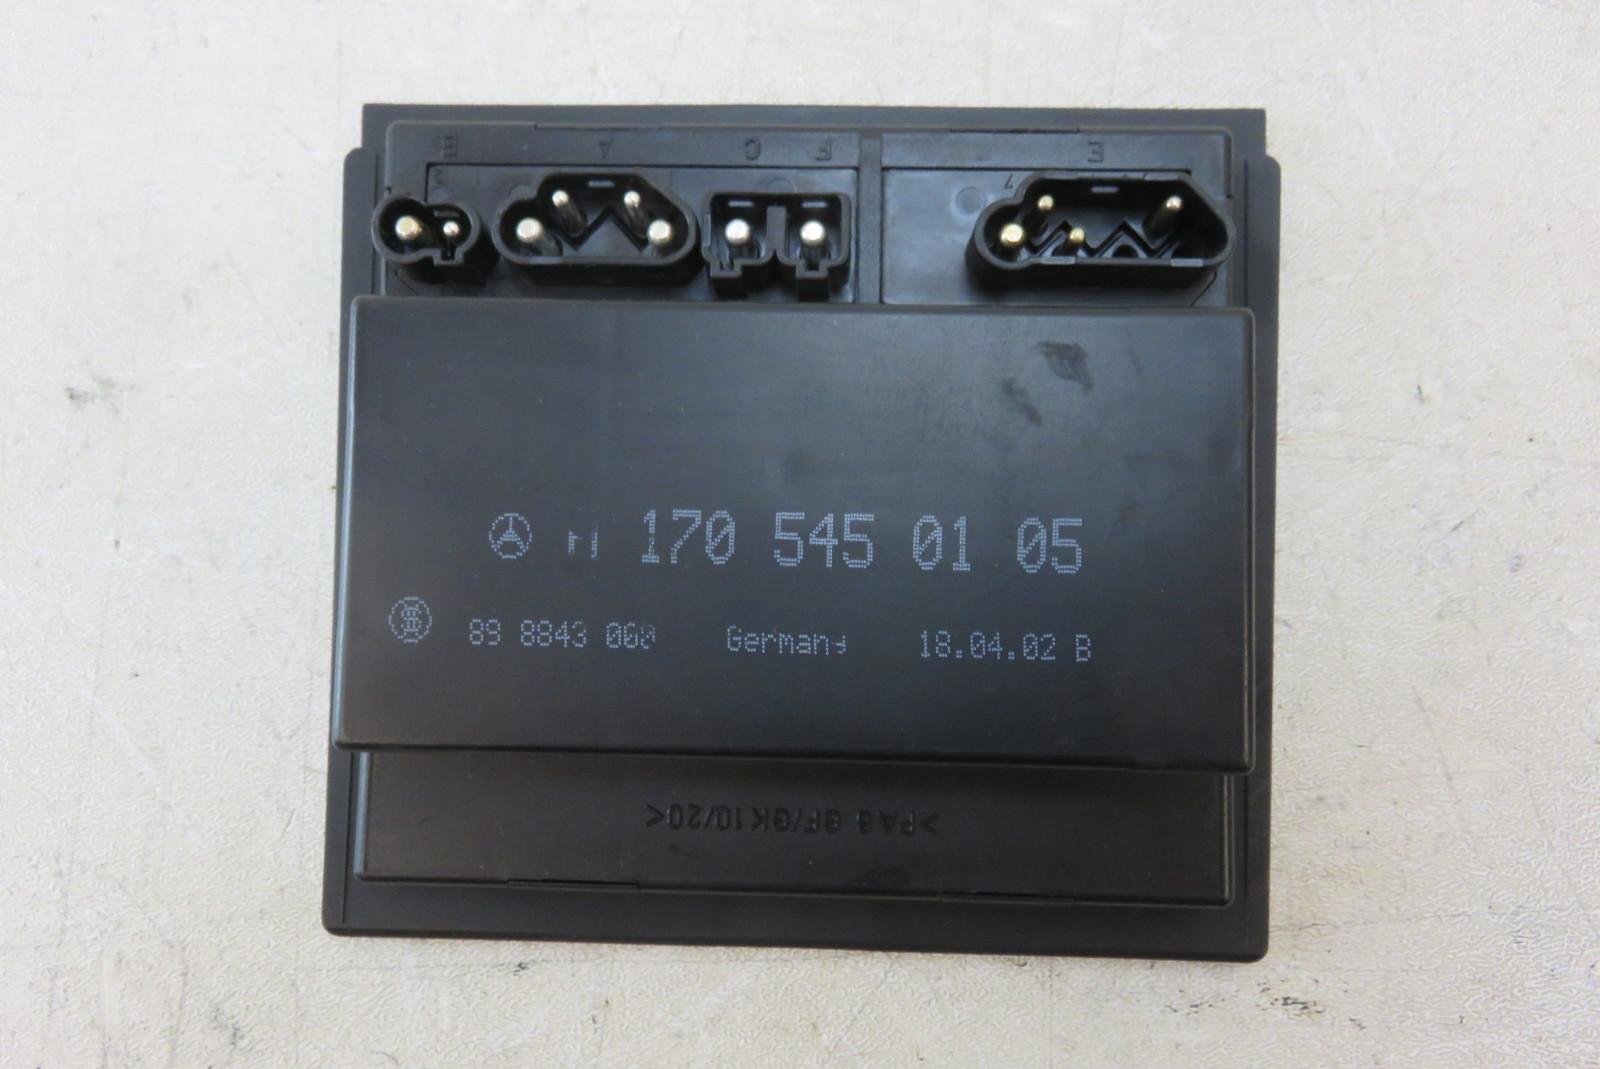 1999 Slk 230 Fuse Diagram Trusted Wiring Diagrams Mercy W124 Box Electricity Basics 101 U2022 Mercedes Kompressor Exterior Lamp